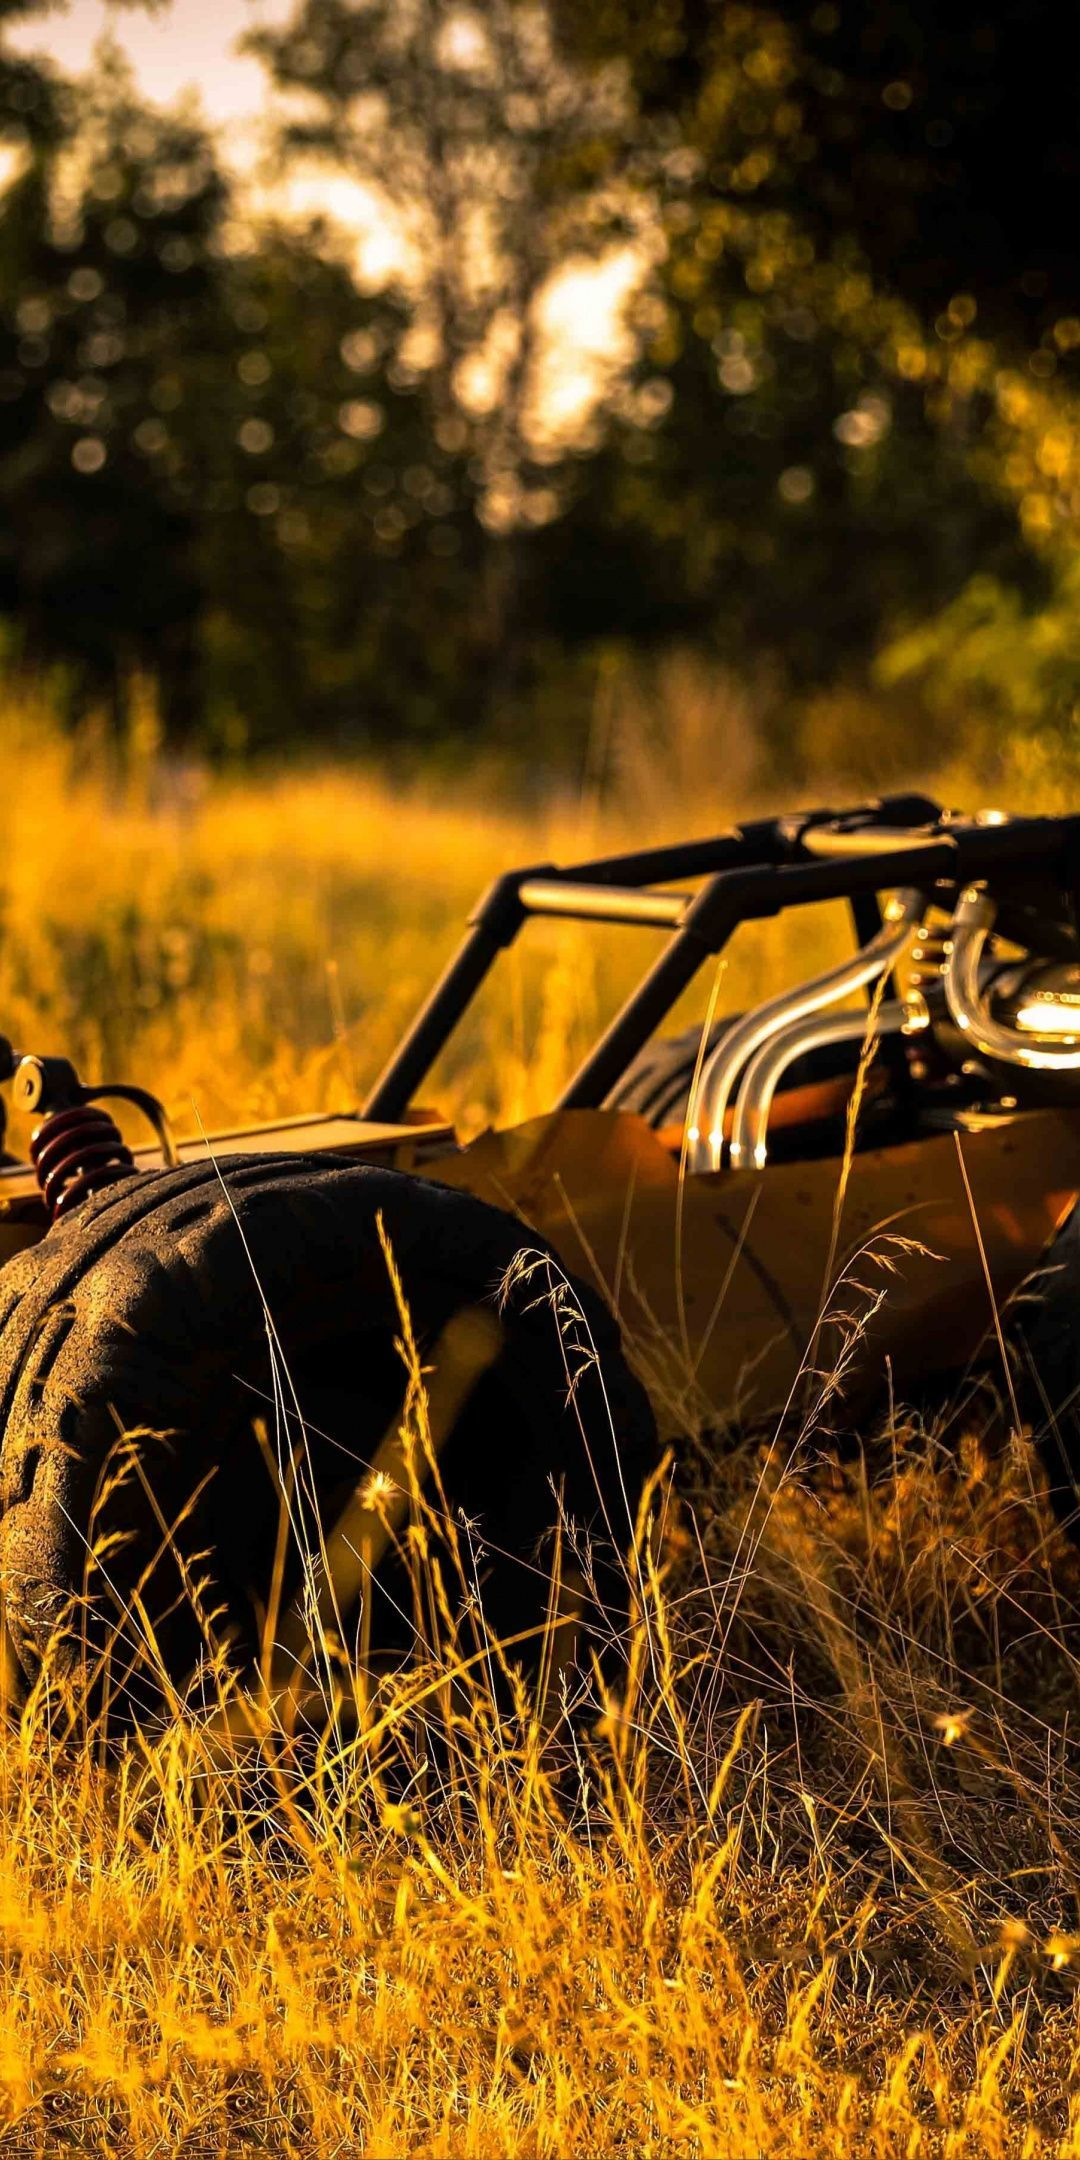 Pubg Buggy Vehicle Landscape 2018 10802160 Wallpaper Wallpaper Ponsel Ponsel